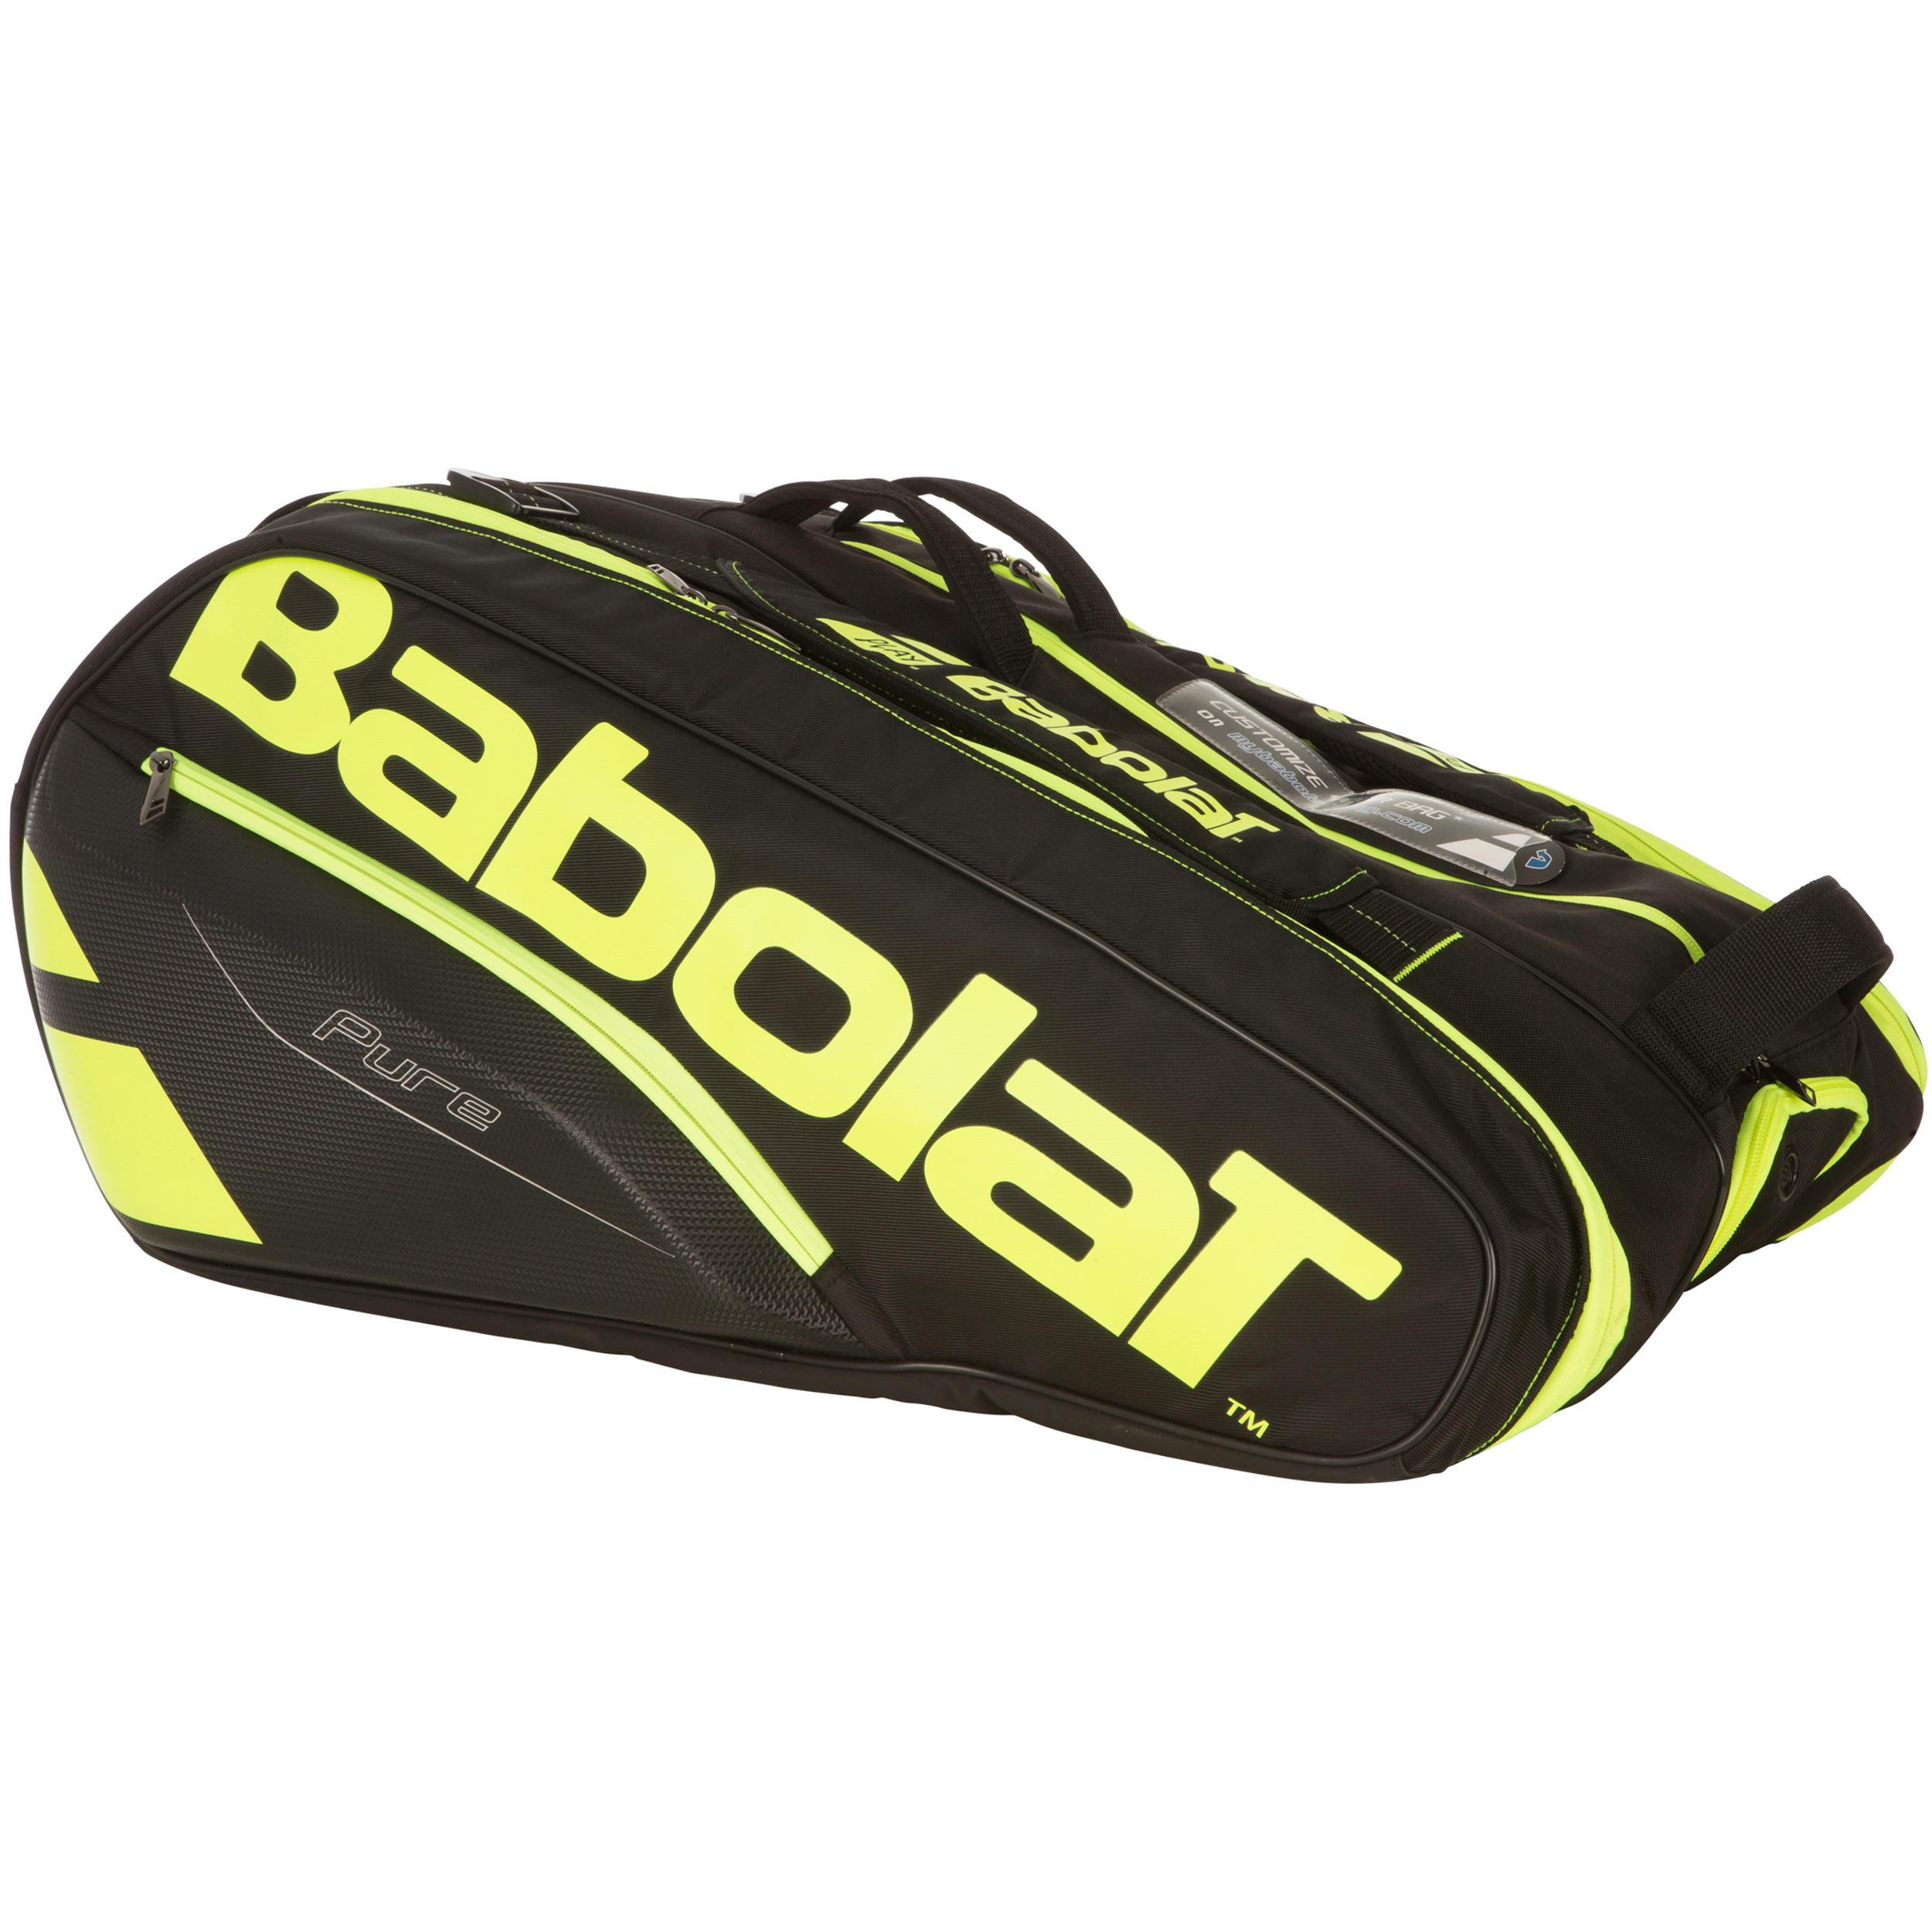 Babolat Sporttas voor 12 rackets Babolat RH Pure Aero zwart/geel